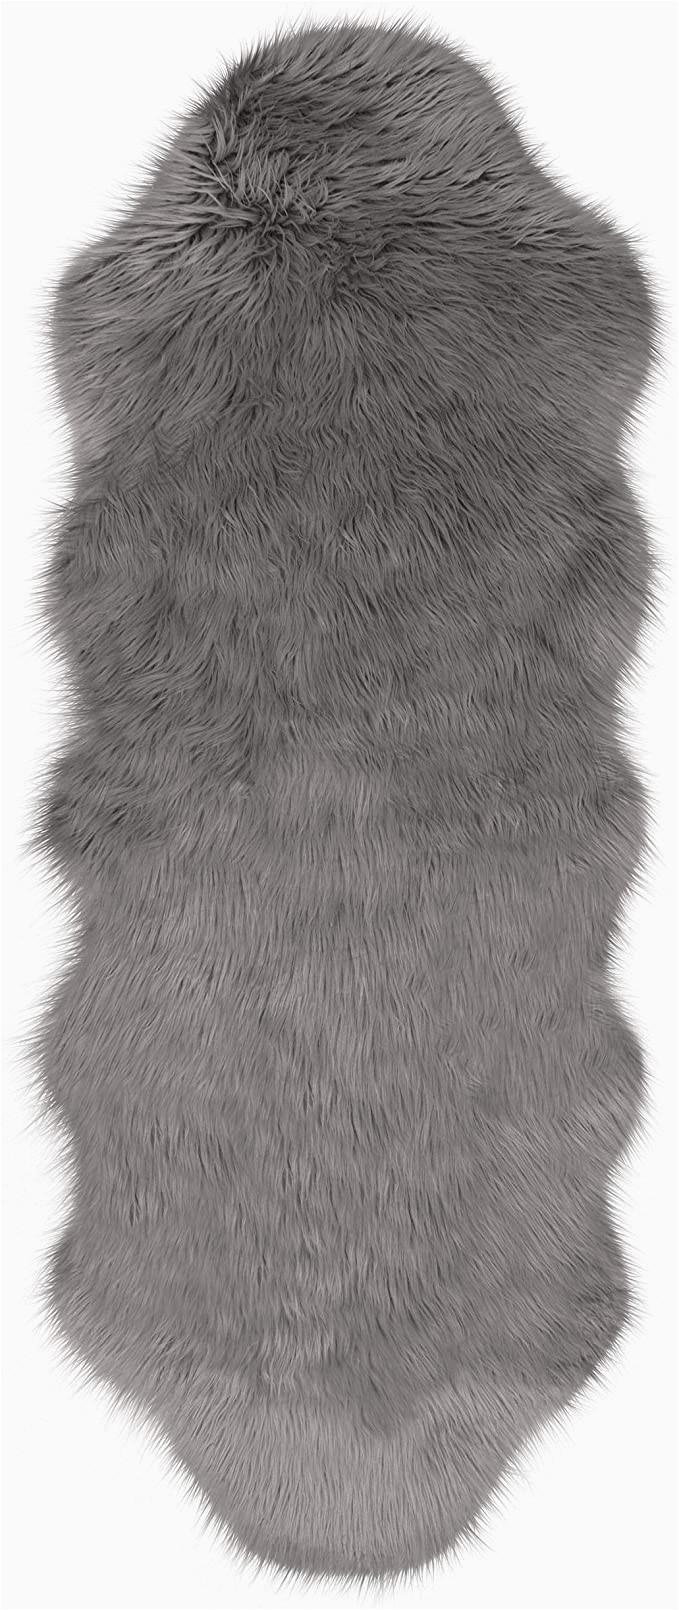 Jean Pierre New York area Rugs Jean Pierre Faux Fur 22 X 60 In Runner area Rug Dark Grey